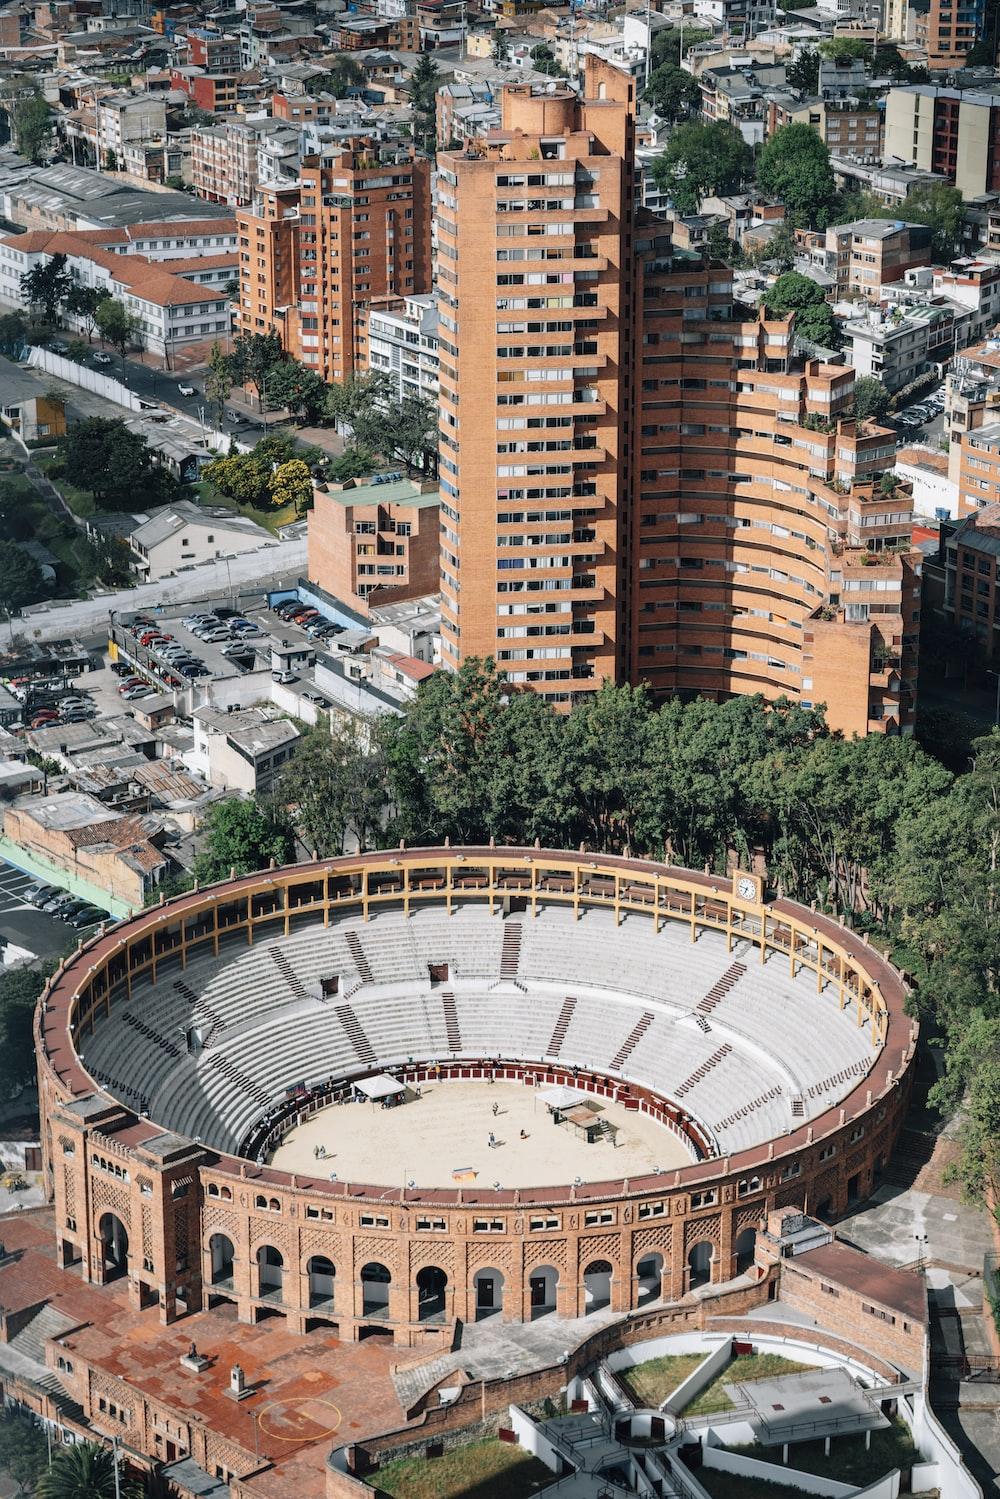 aerial-photography of stadium